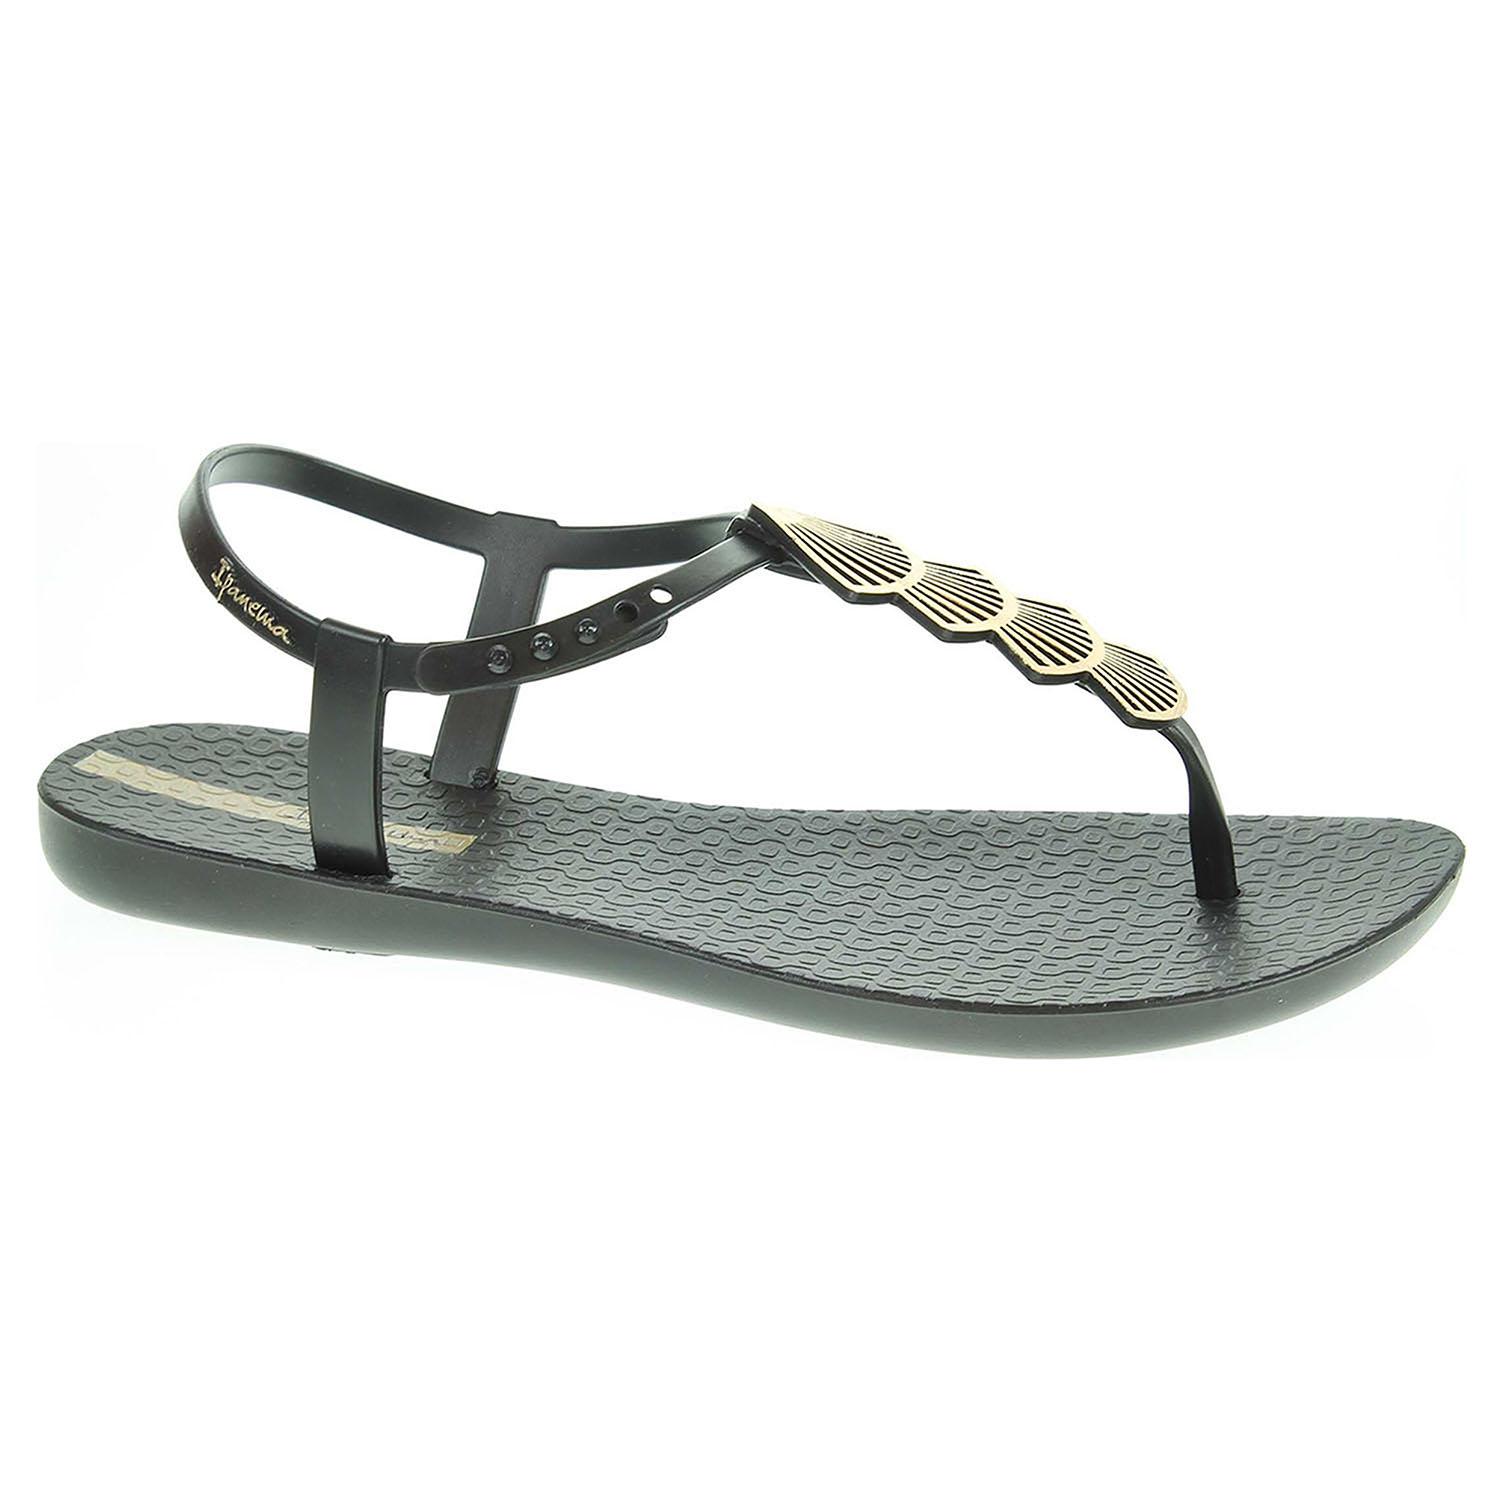 17e6d98ef705 detail Plážové sandály Ipanema dámské 26207 20766 black-black